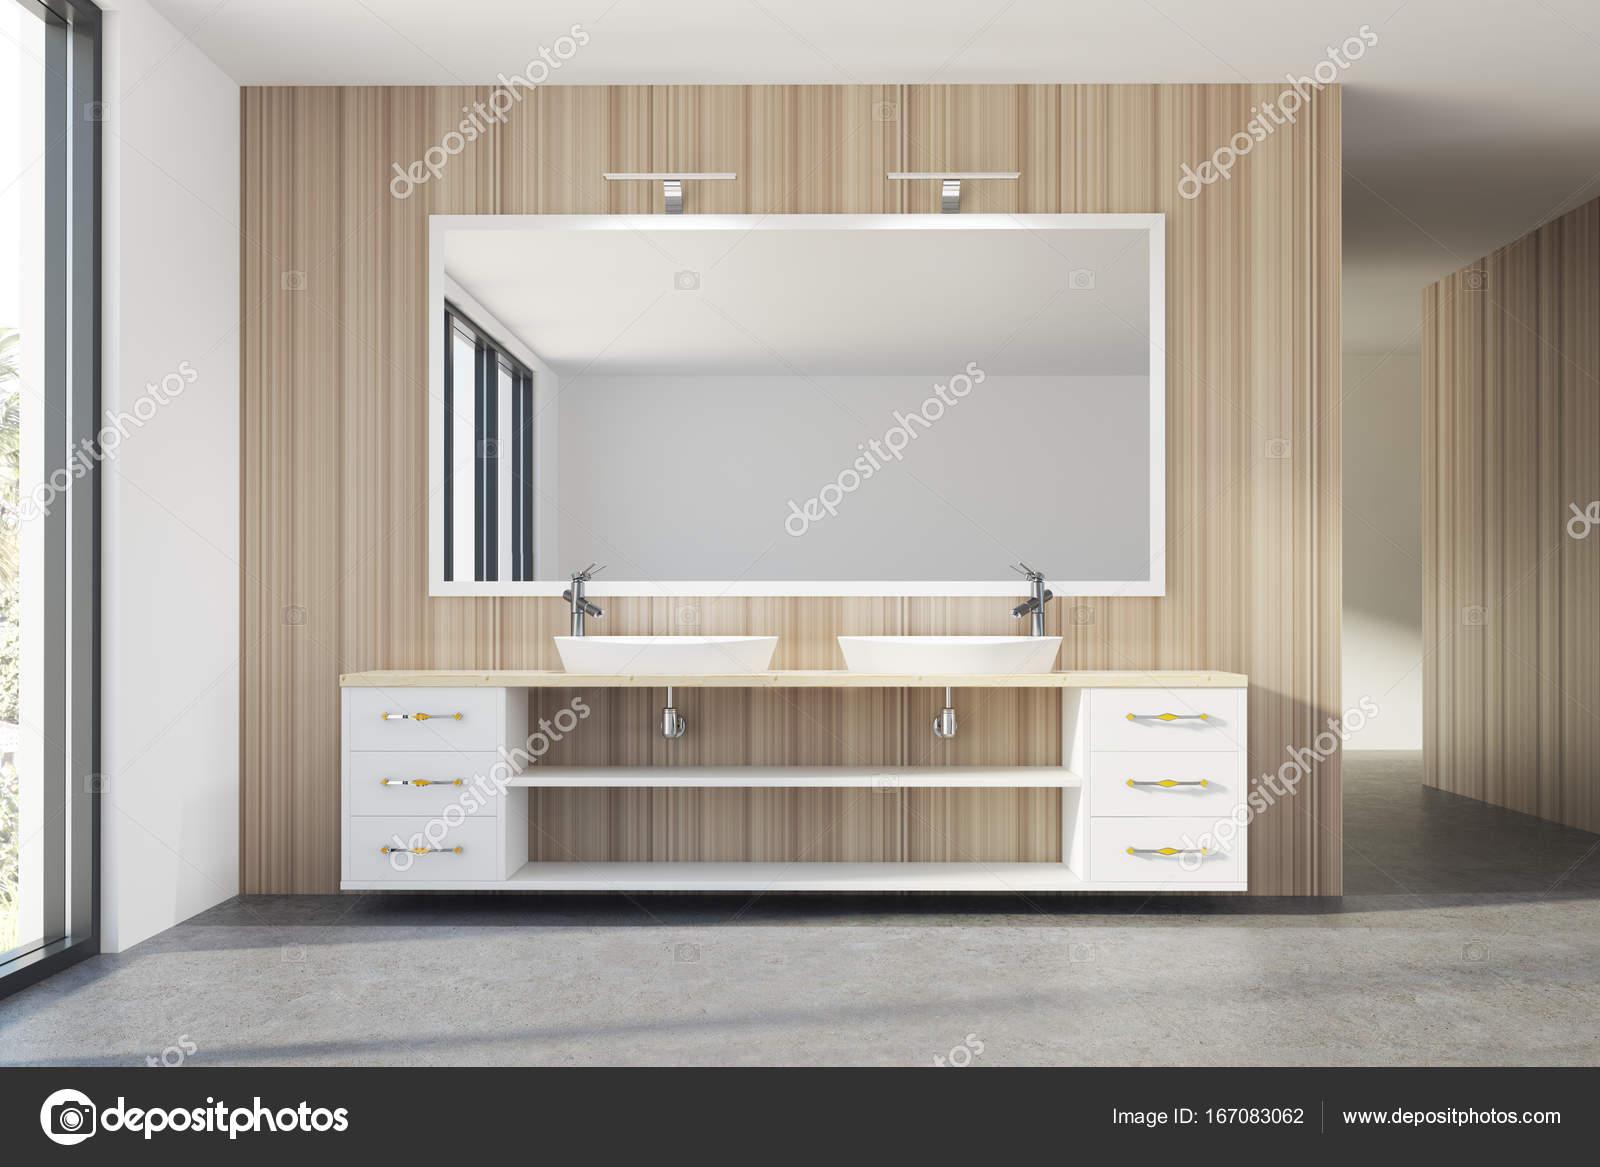 https://st3.depositphotos.com/2673929/16708/i/1600/depositphotos_167083062-stockafbeelding-houten-badkamer-dubbele-wastafel.jpg